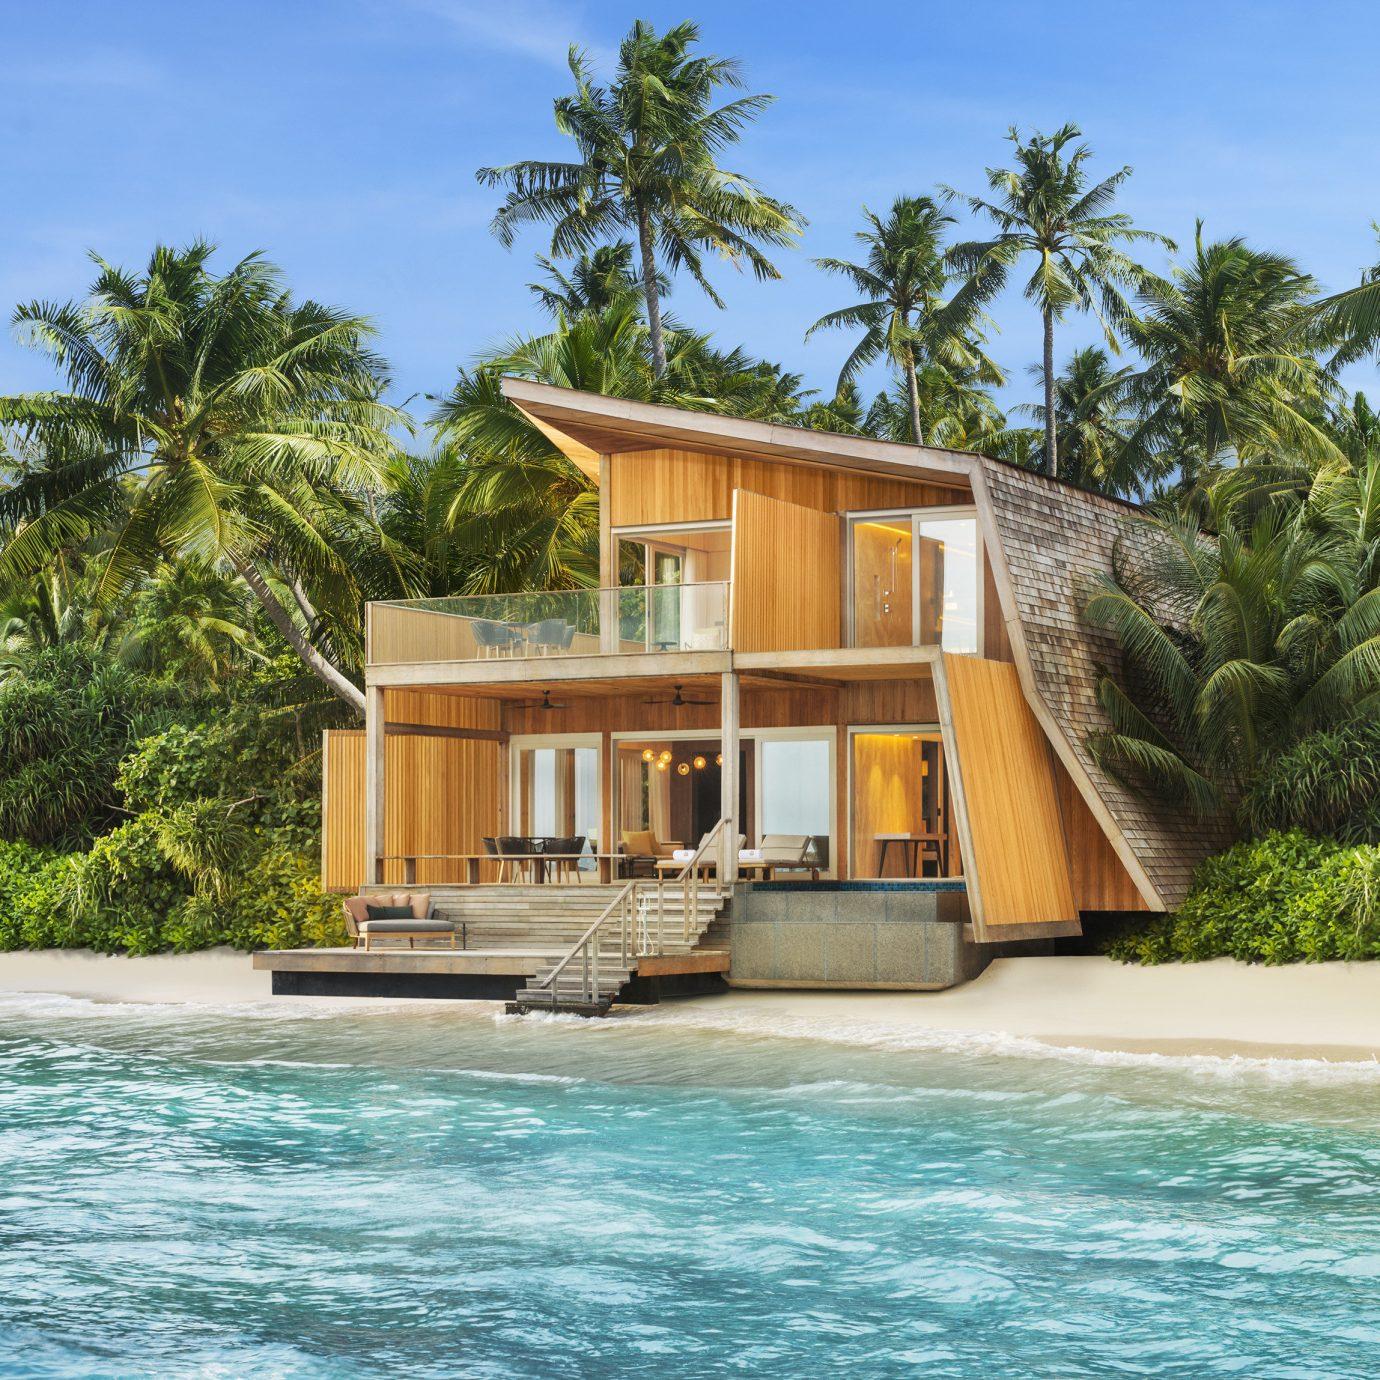 Hotels Offbeat tree water sky property house Resort caribbean swimming pool Villa home Lagoon Island Sea Beach tropics shore swimming